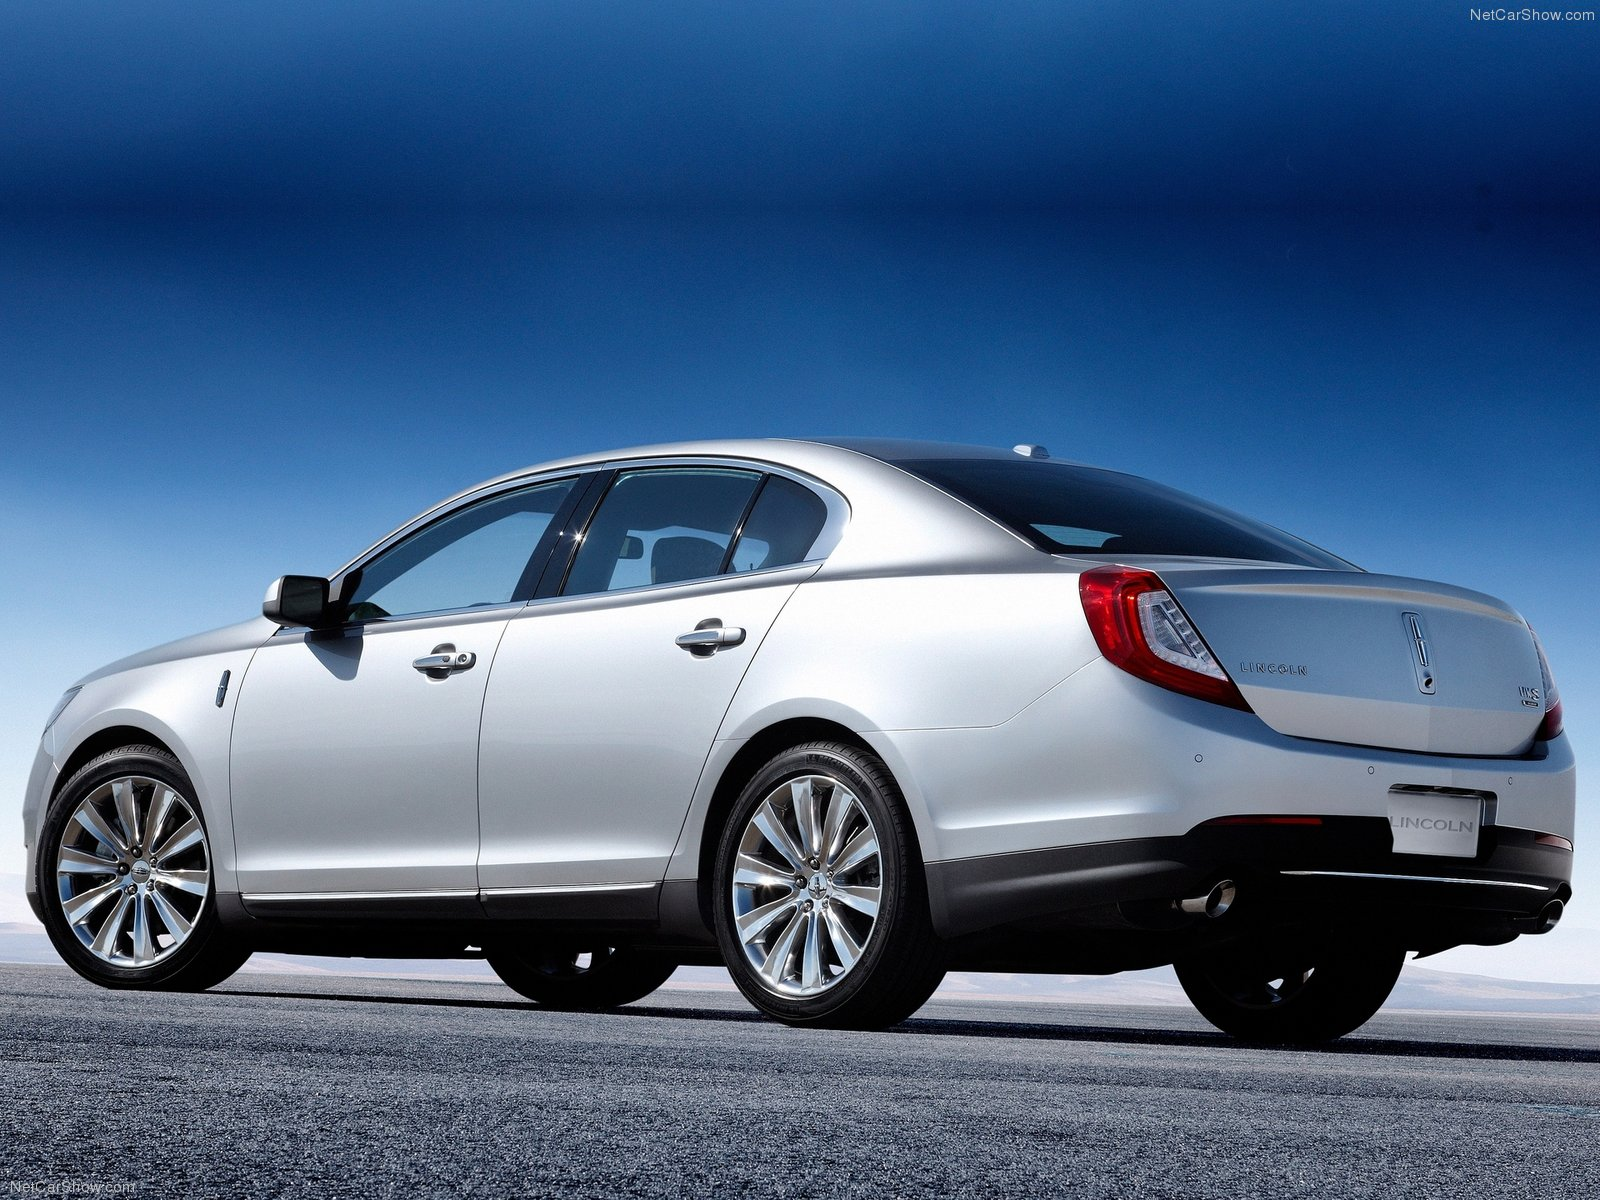 3DTuning of Lincoln MKS Sedan 2013 3DTuning.com - unique ...